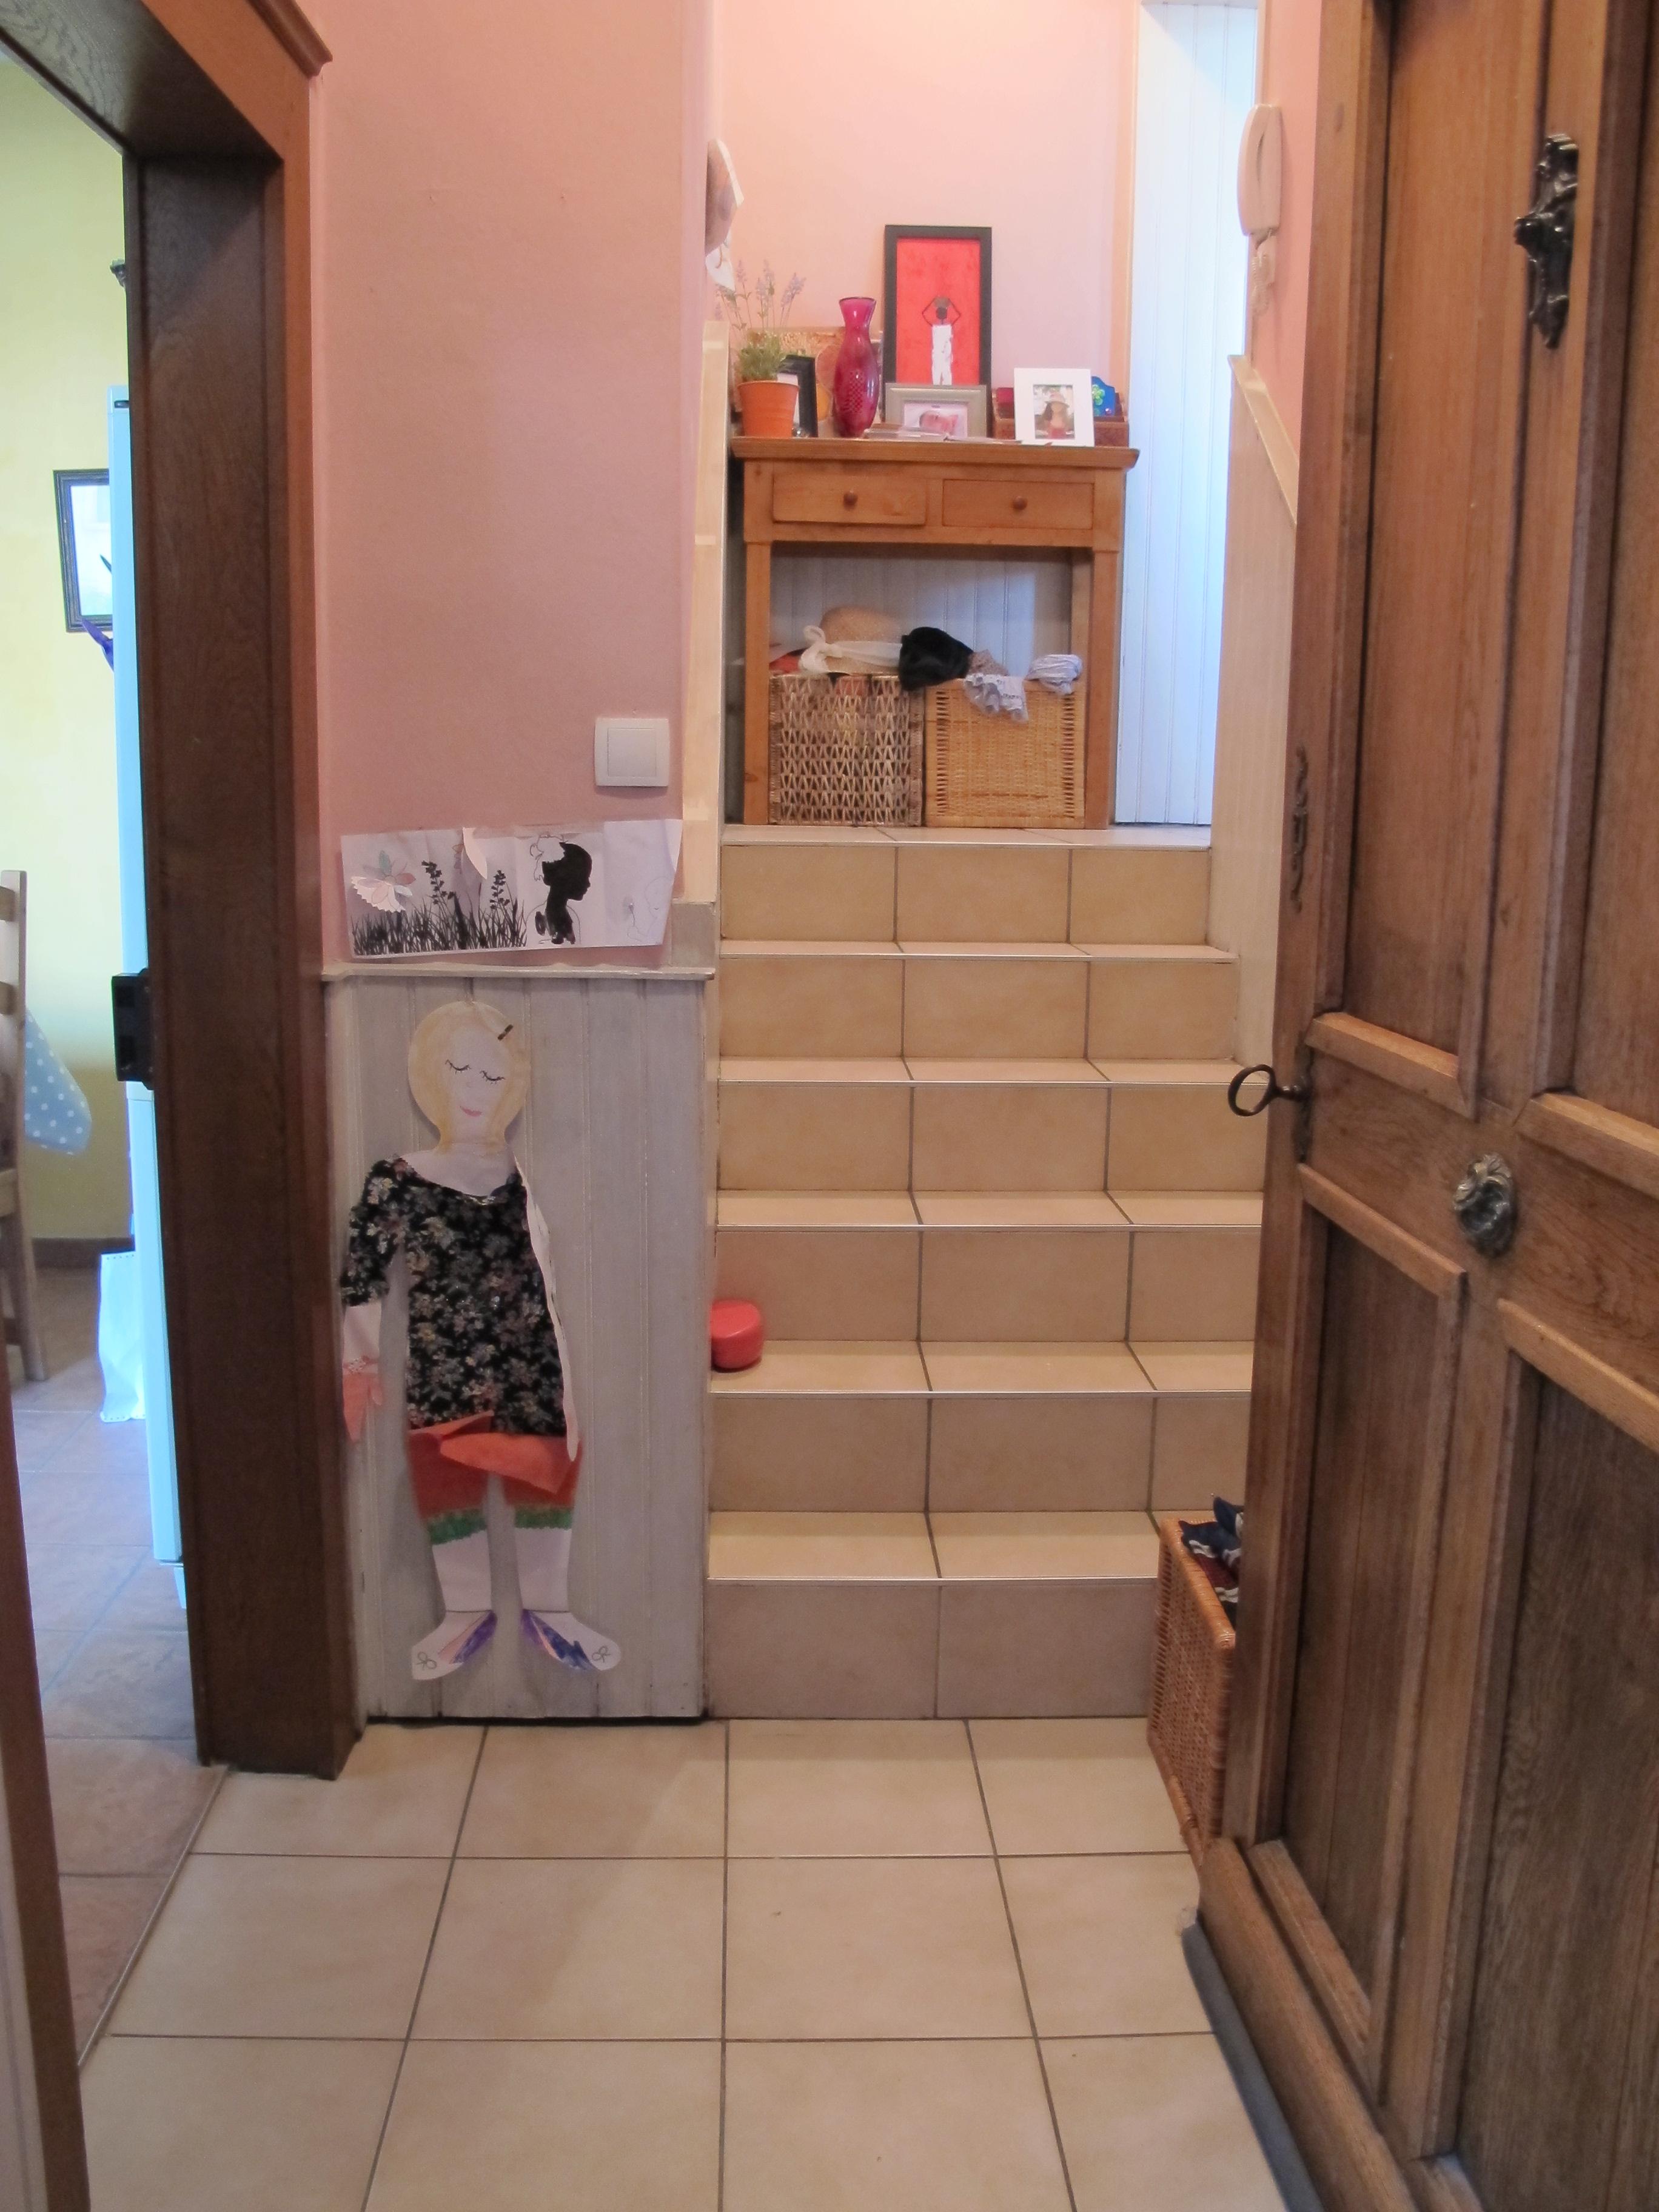 Avec Quoi Recouvrir Un Escalier En Carrelage recouvrir un escalier carrele - communauté leroy merlin